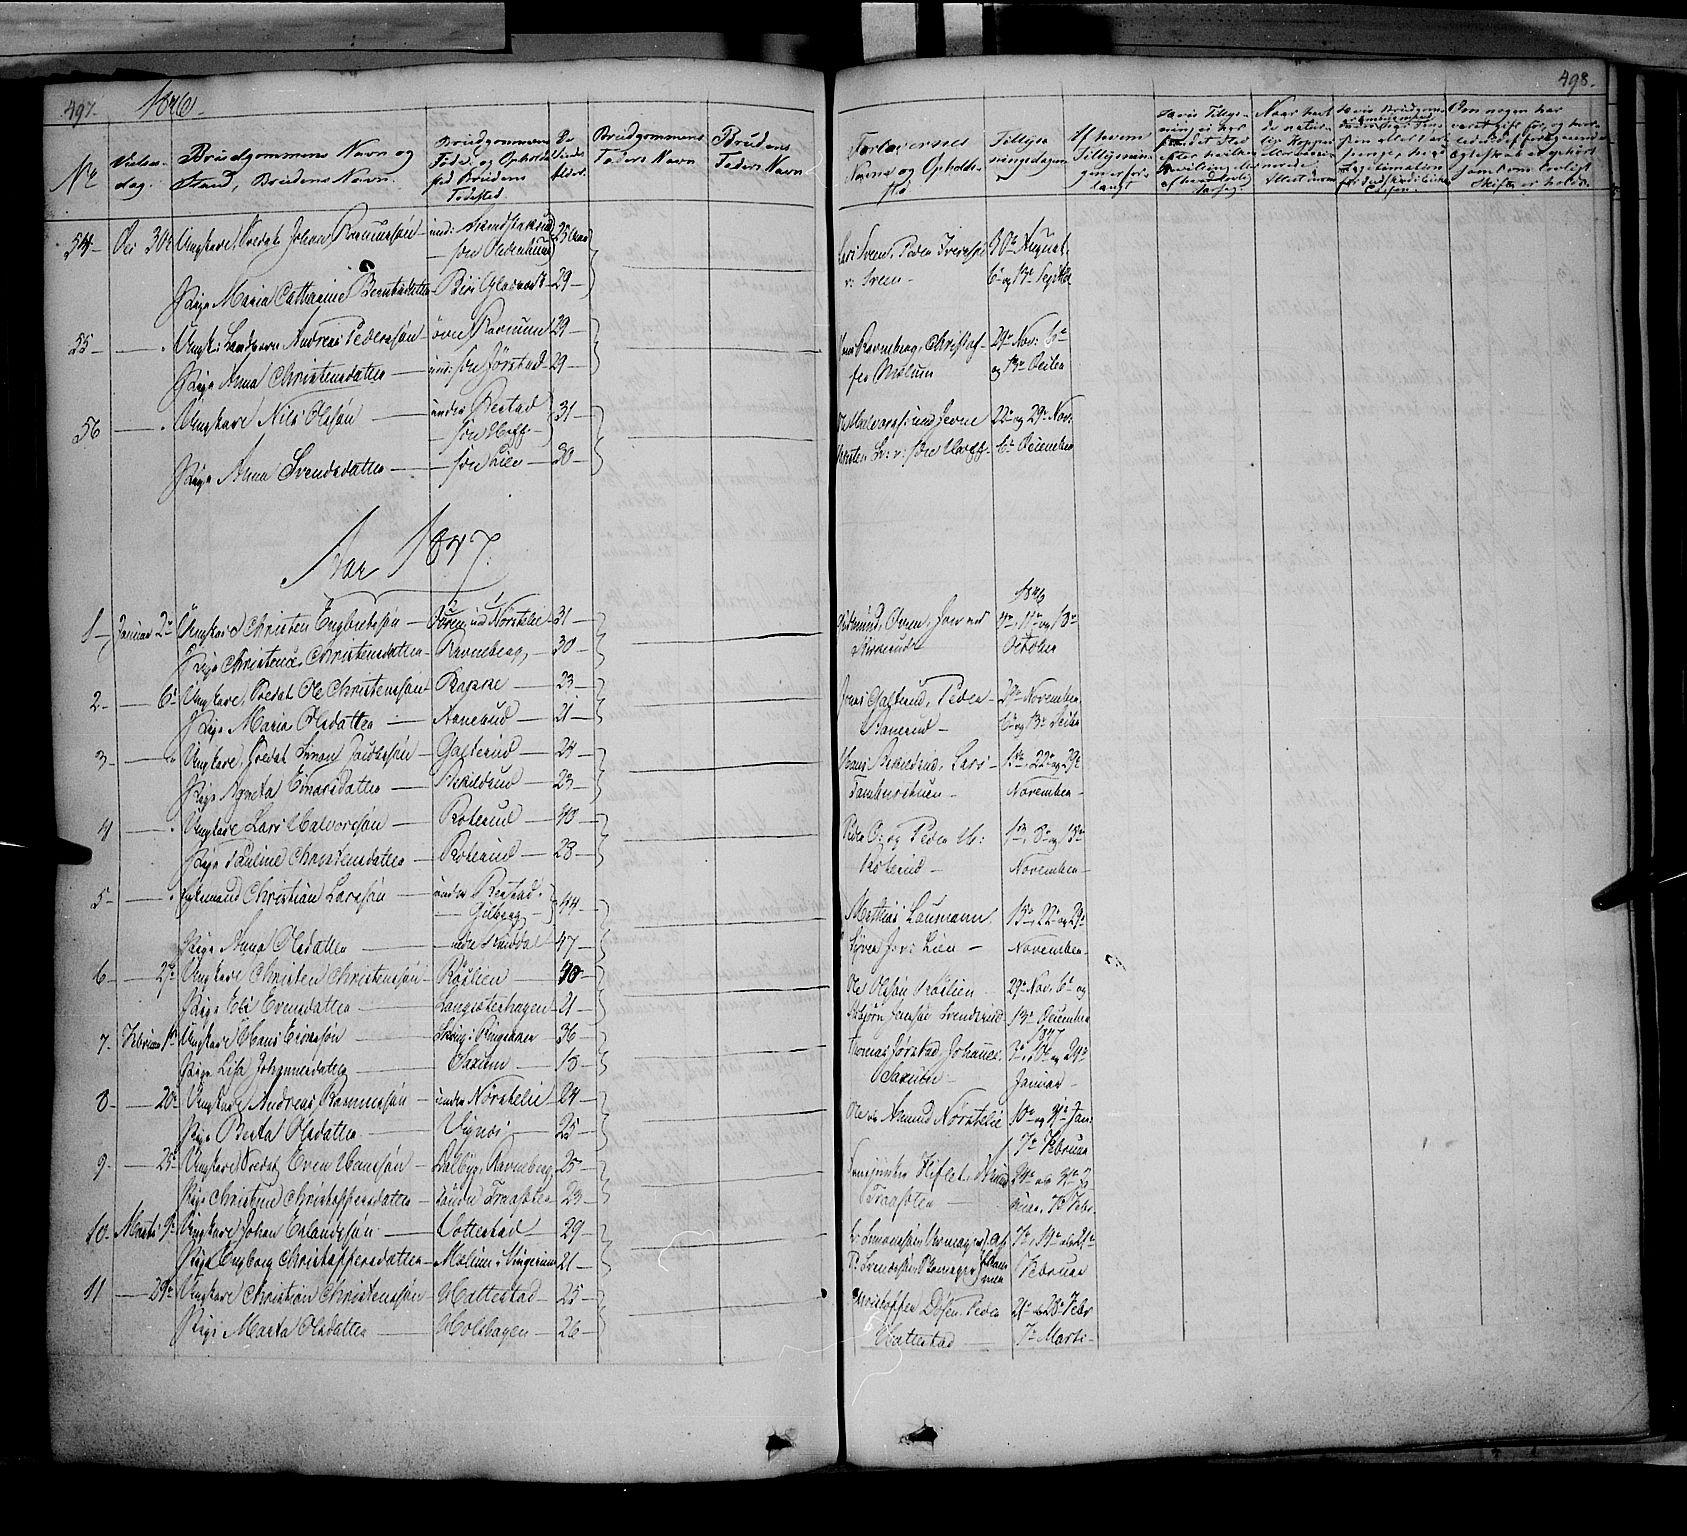 SAH, Fåberg prestekontor, Ministerialbok nr. 5, 1836-1854, s. 497-498